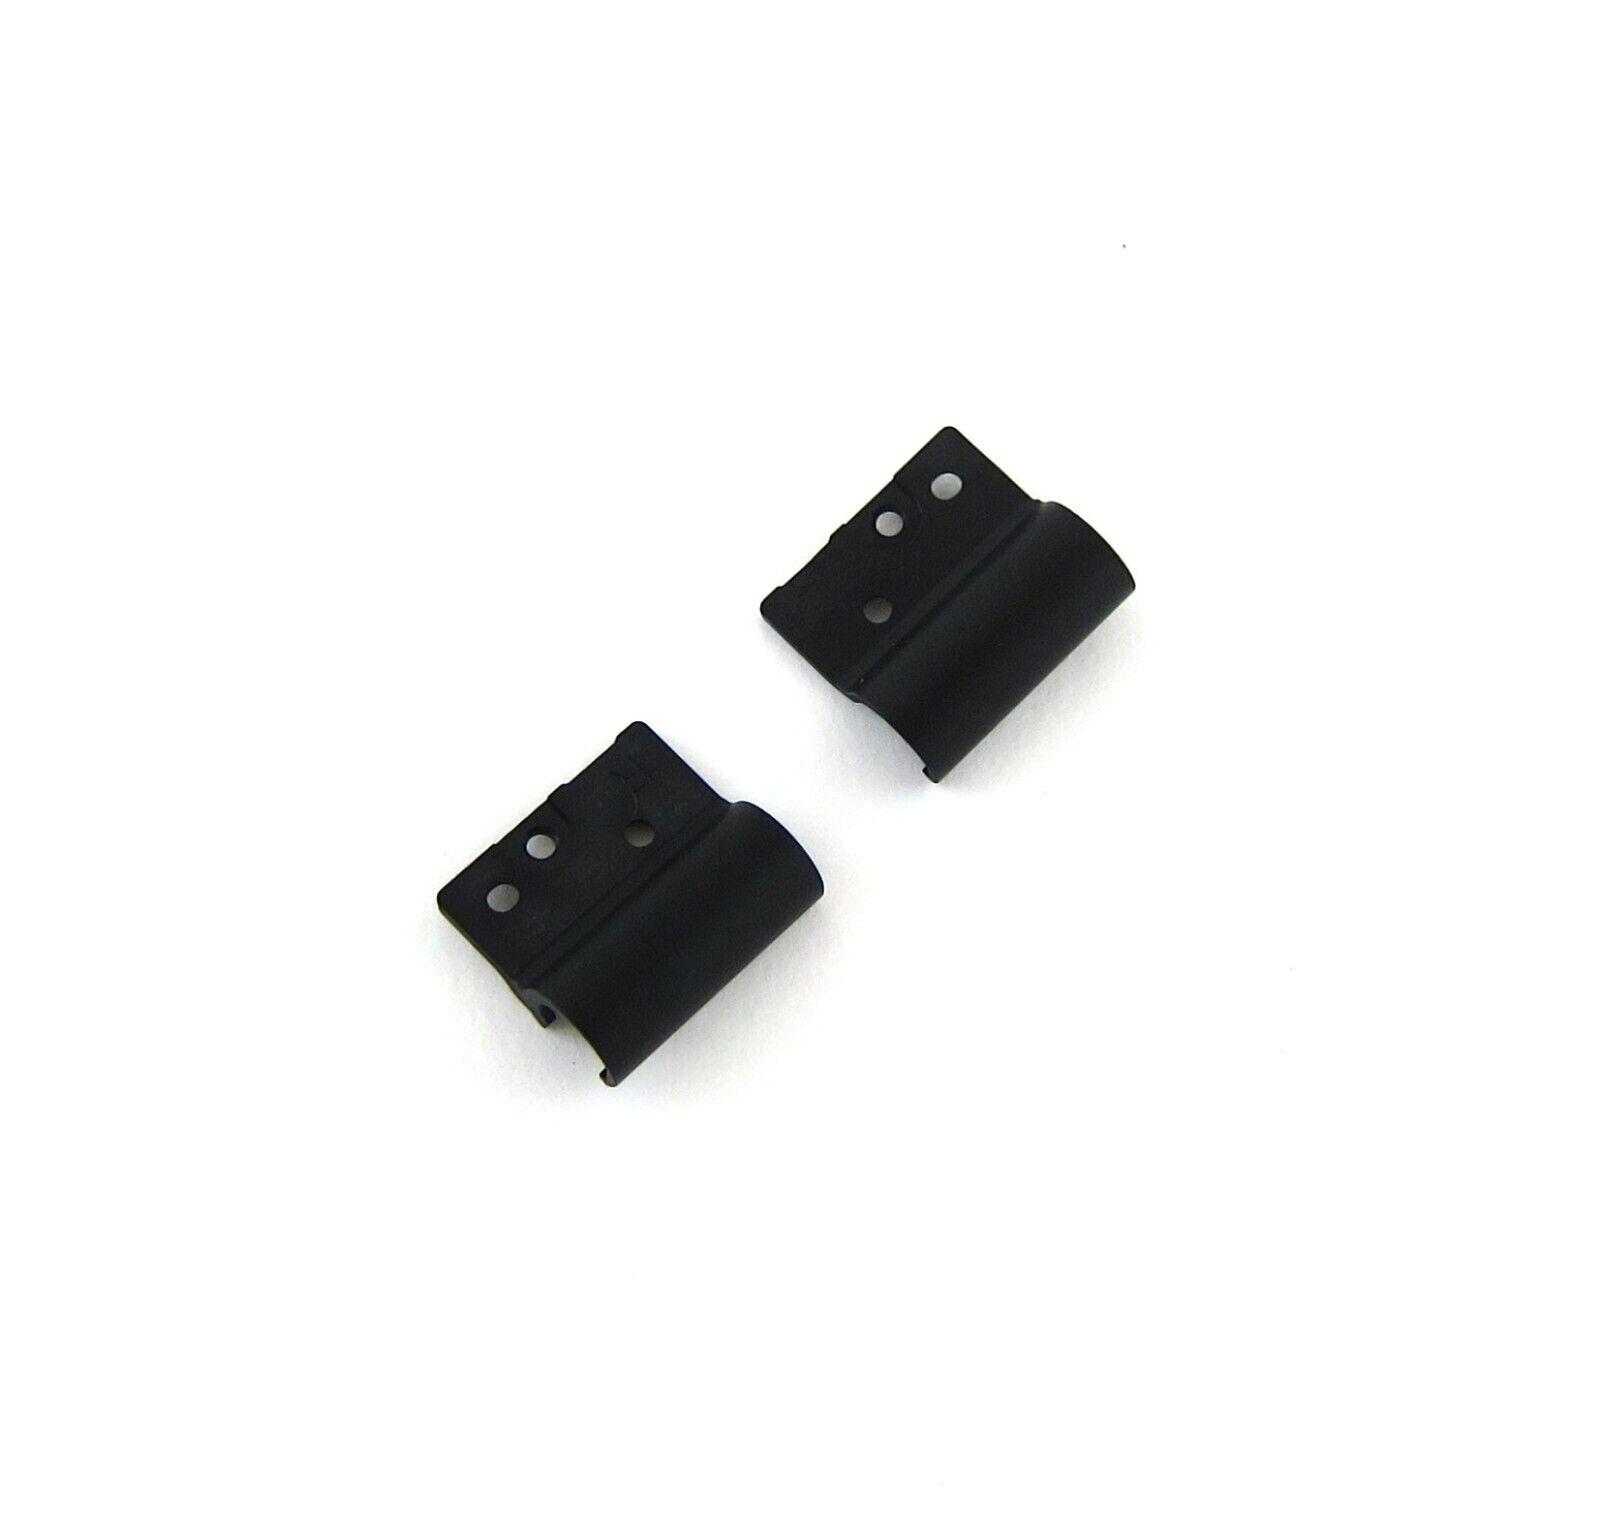 New OEM Alienware 13 R1 / R2 Hinge Covers Caps Left / Right Set - 3TJW0 W6VH7